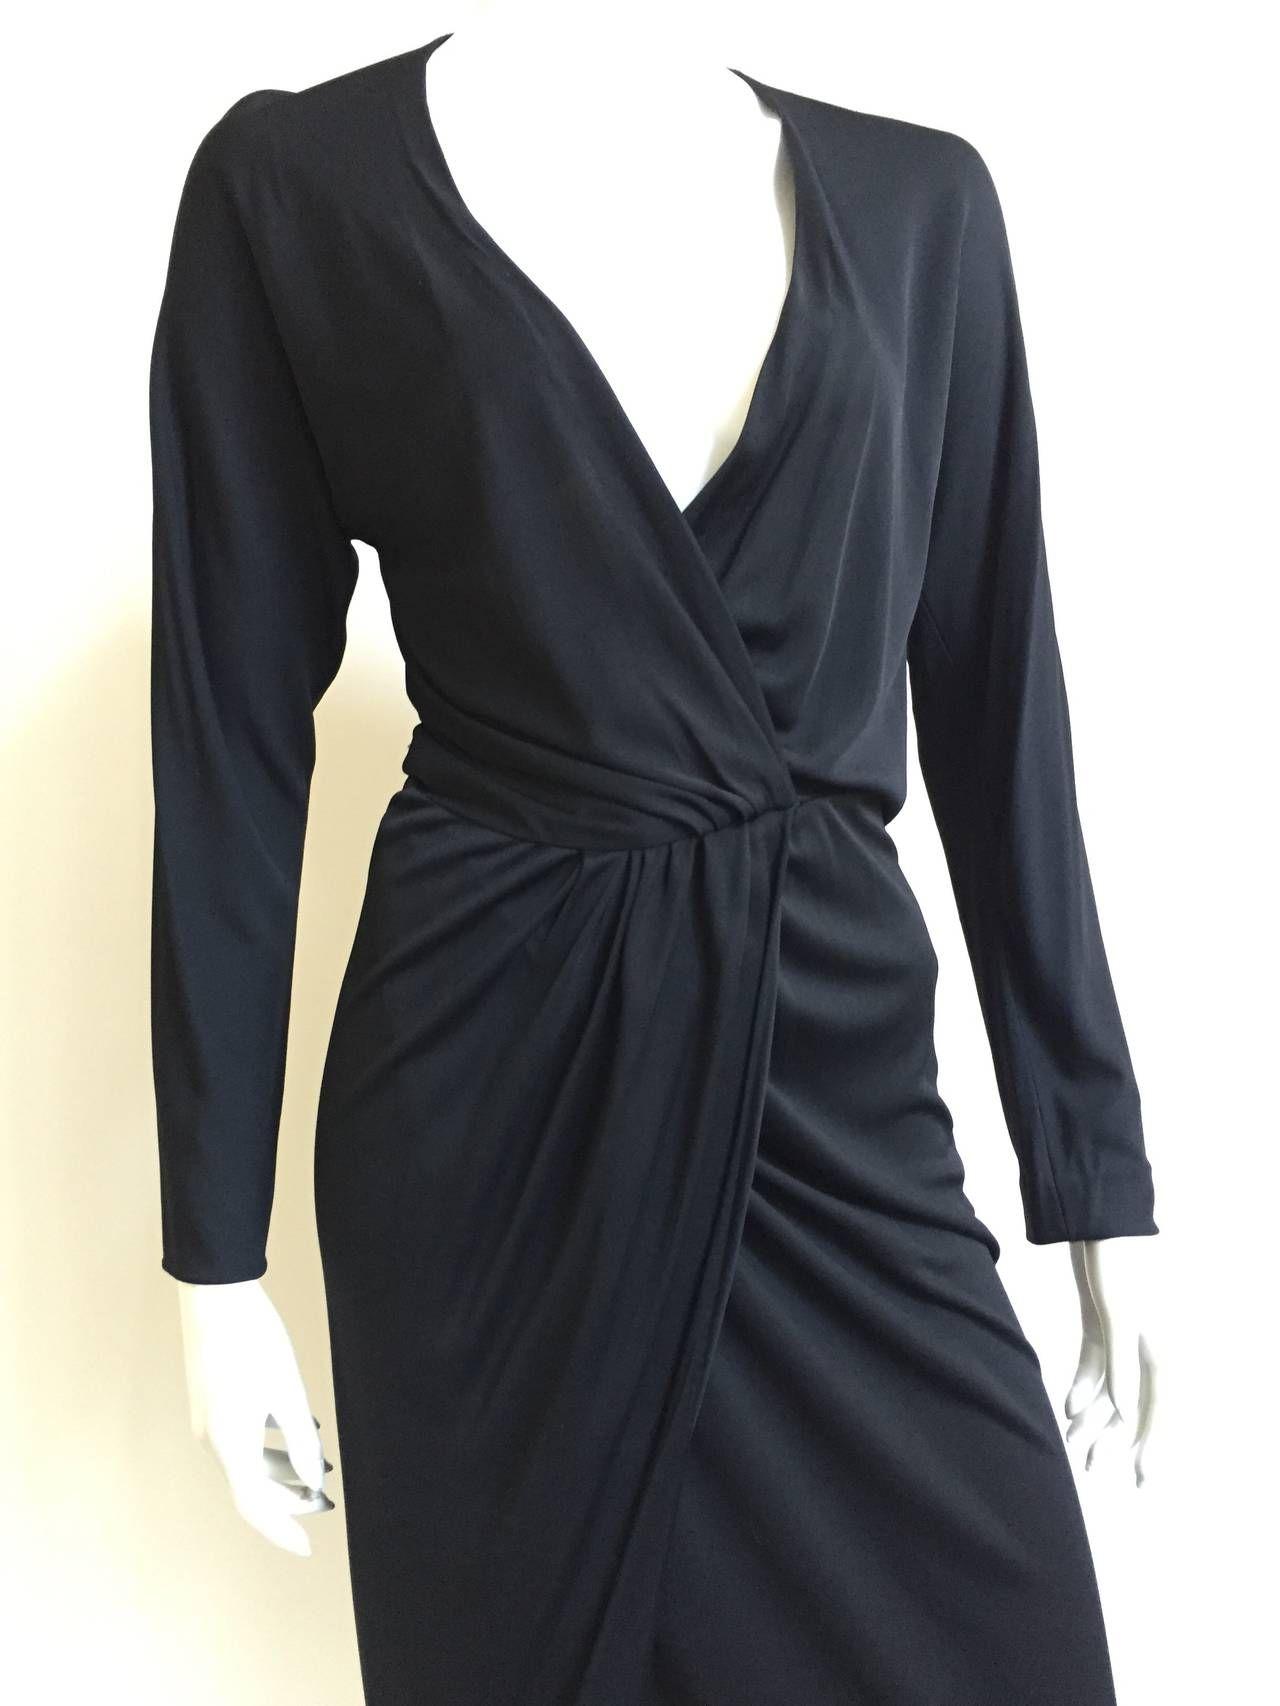 Halston 70s Black Jersey Wrap Dress Size 4 1stdibs Com Evening Dresses Wrap Dress Jersey Wrap Dress [ 1706 x 1280 Pixel ]